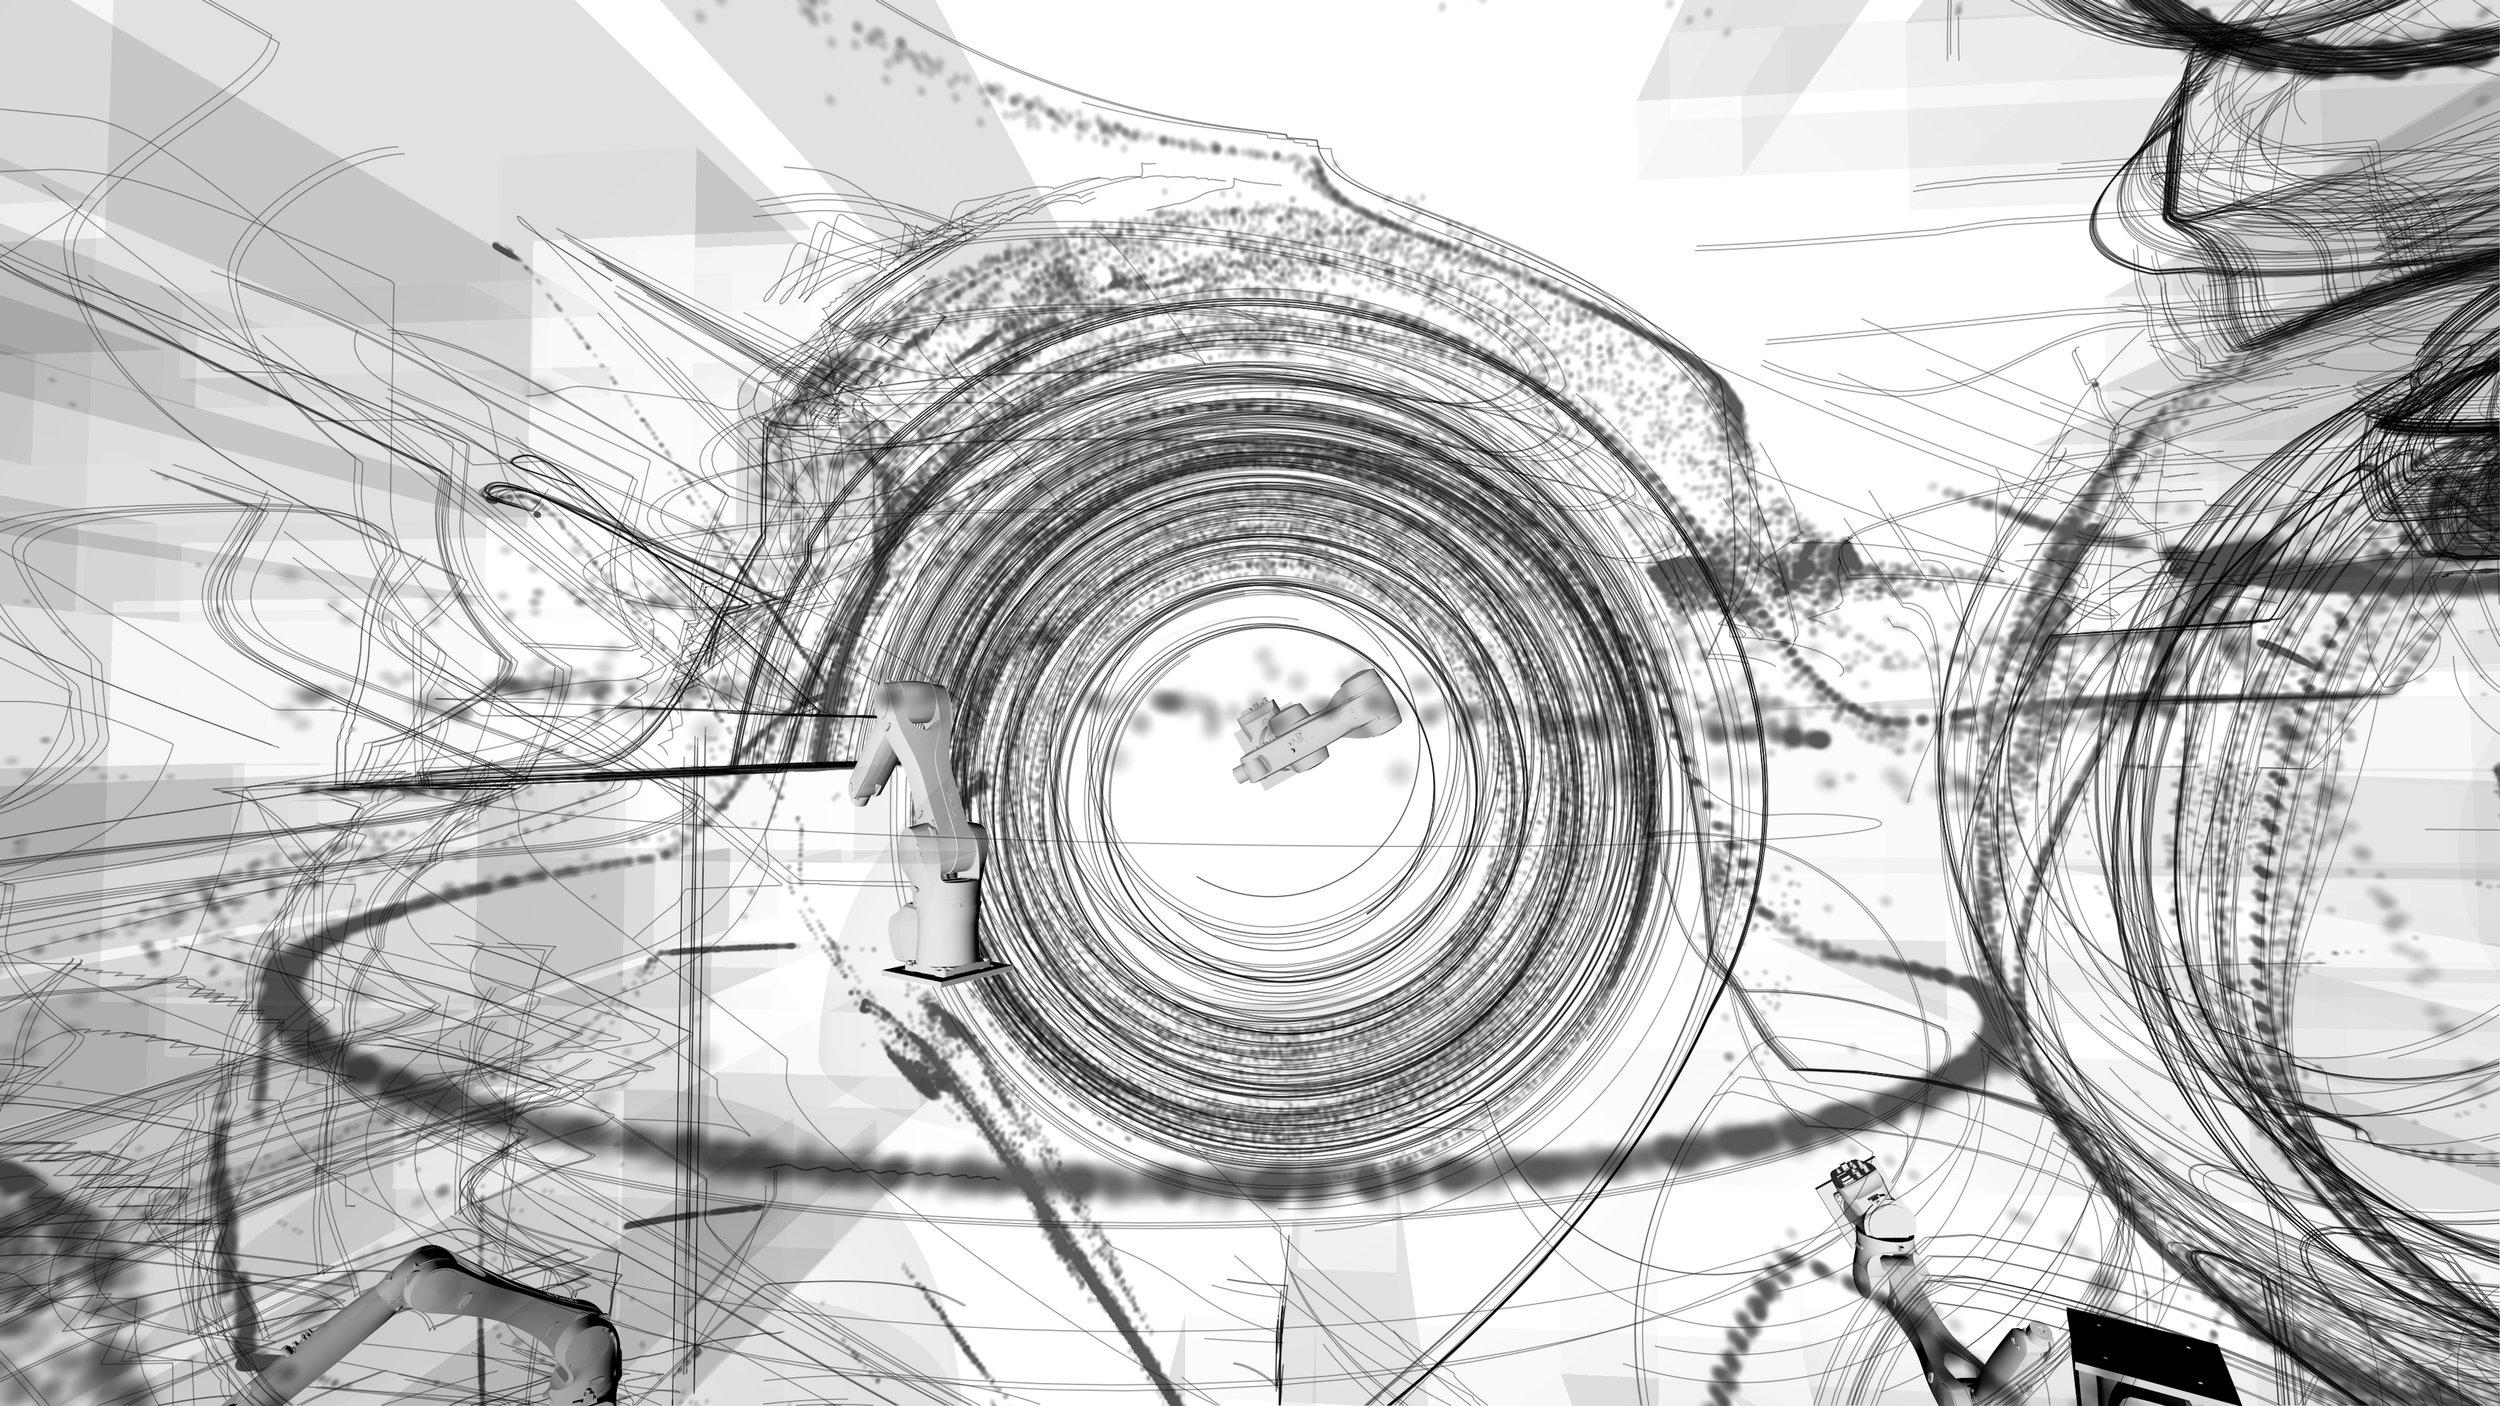 Web_machinespectacle_alexandramoisi_adrianherk_floriansmutny_particlediagram_ws15.jpg